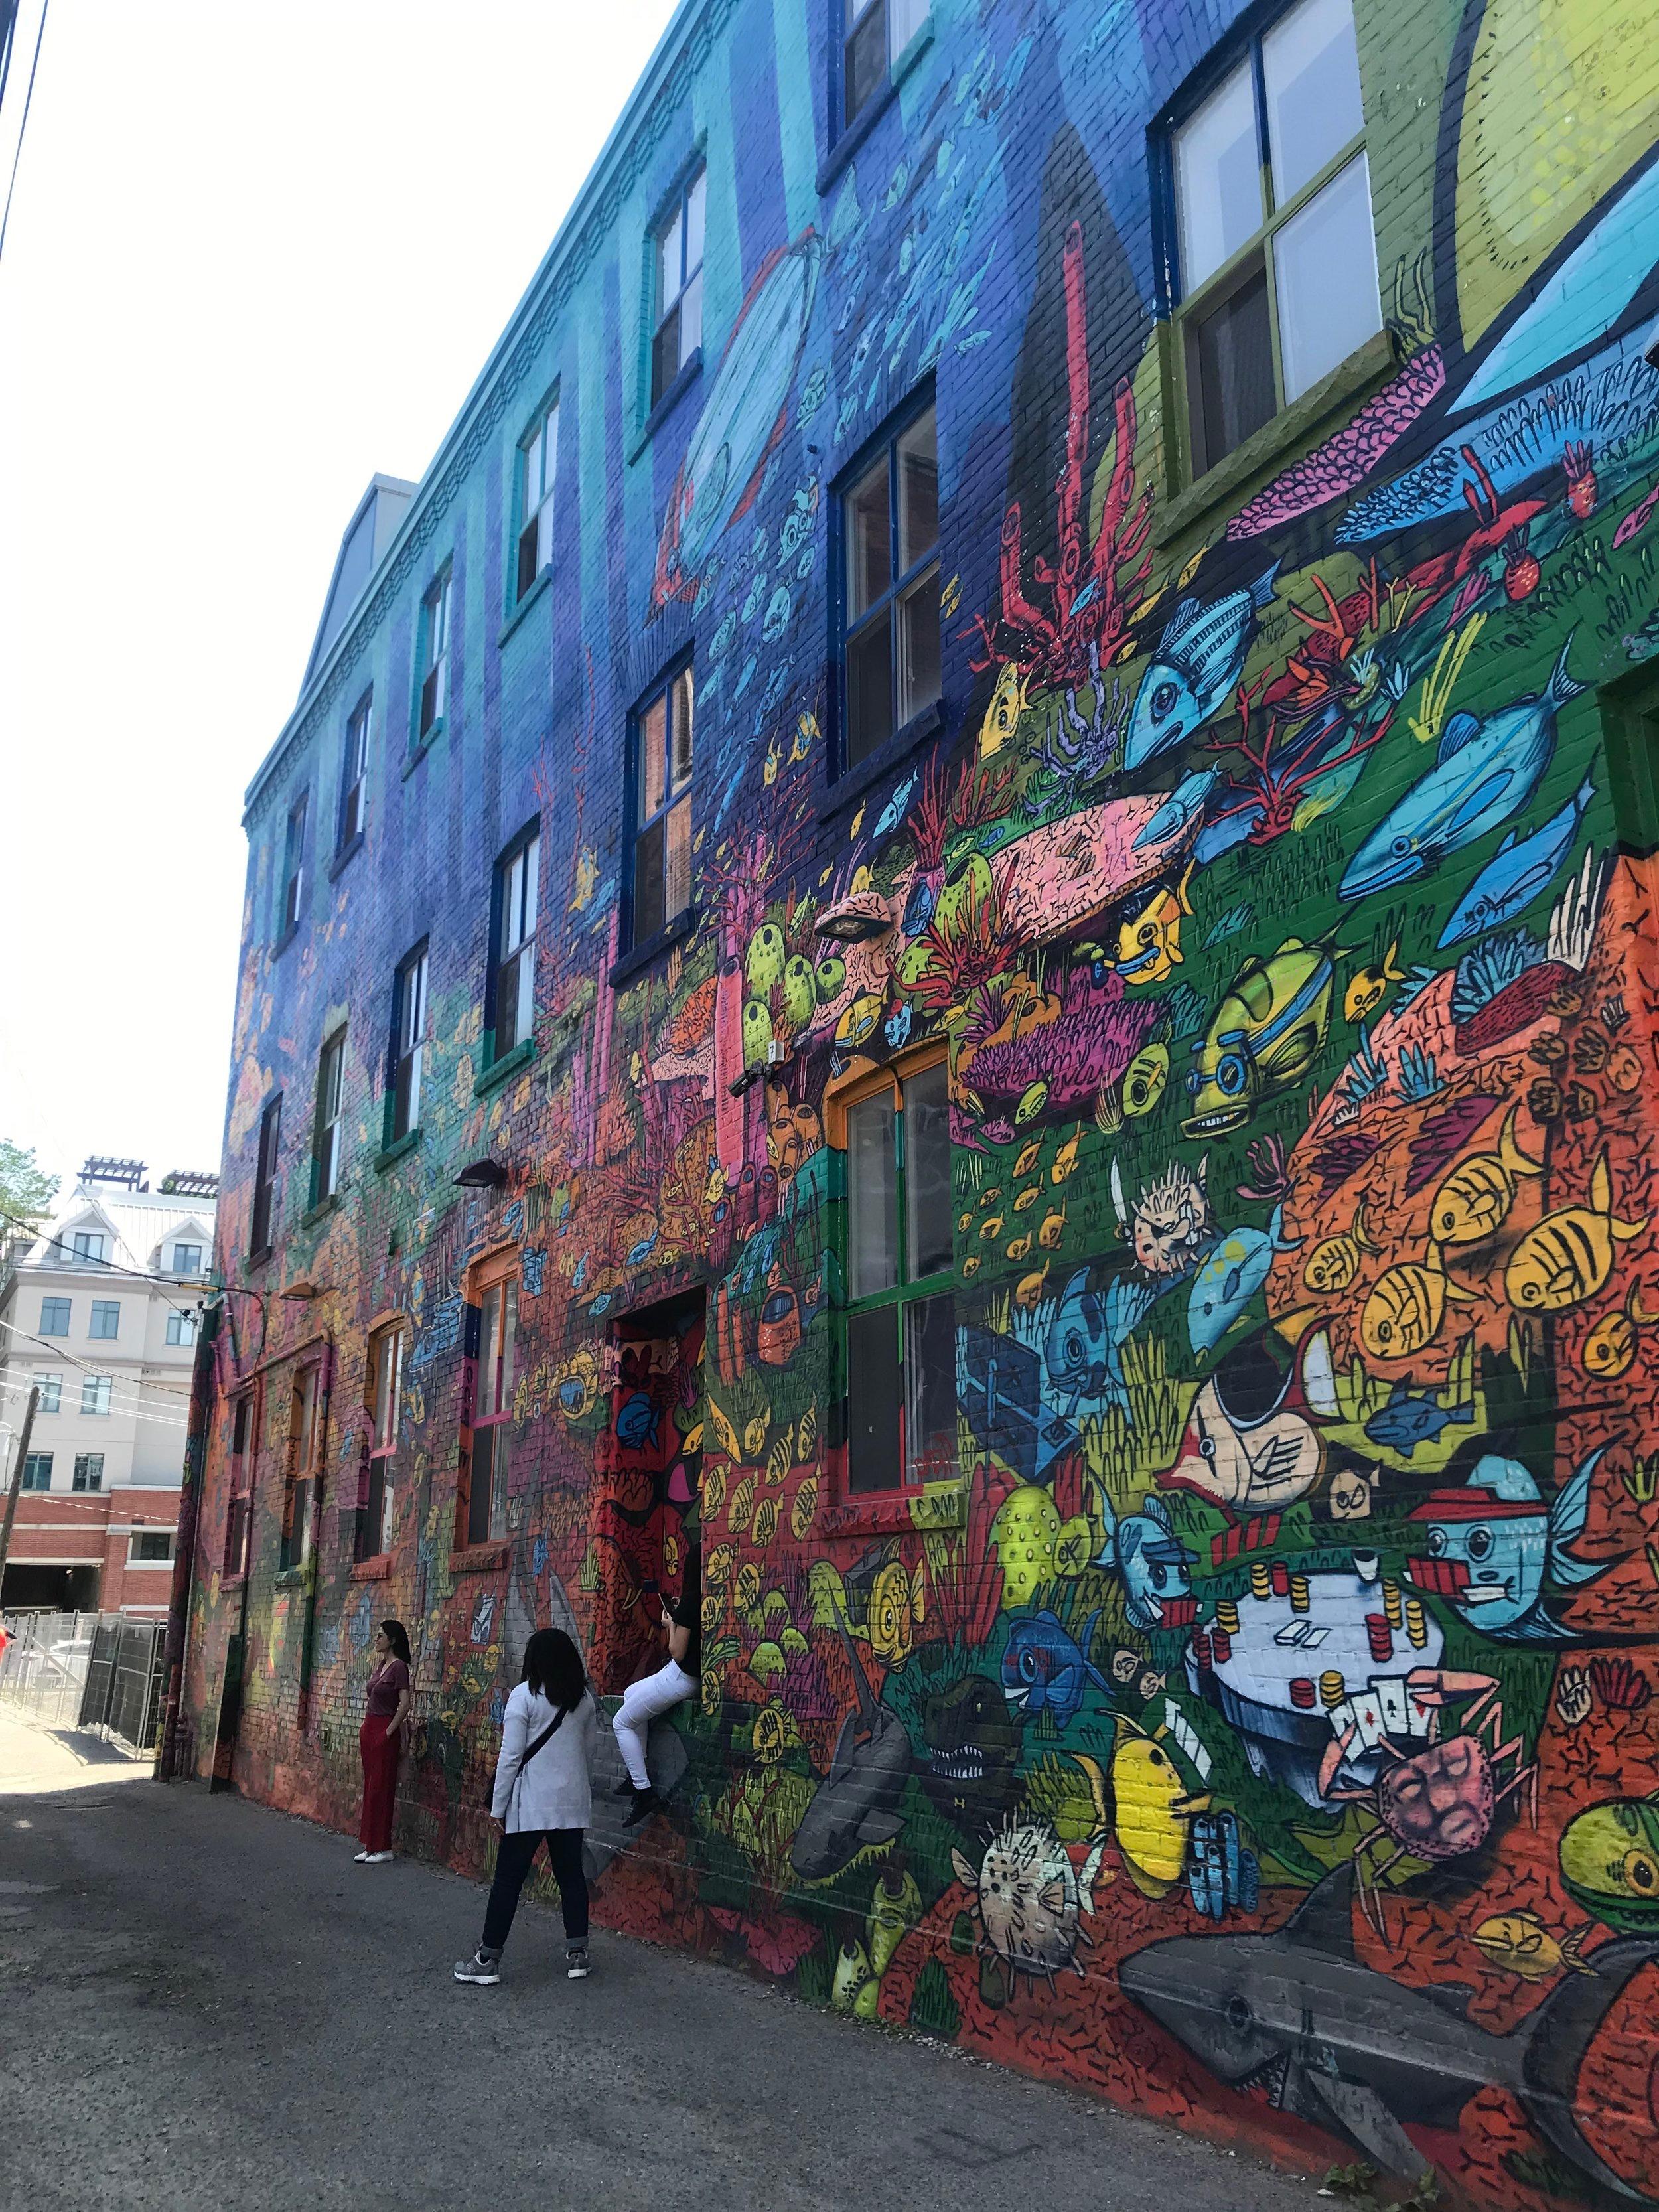 Part of Graffiti Alley.